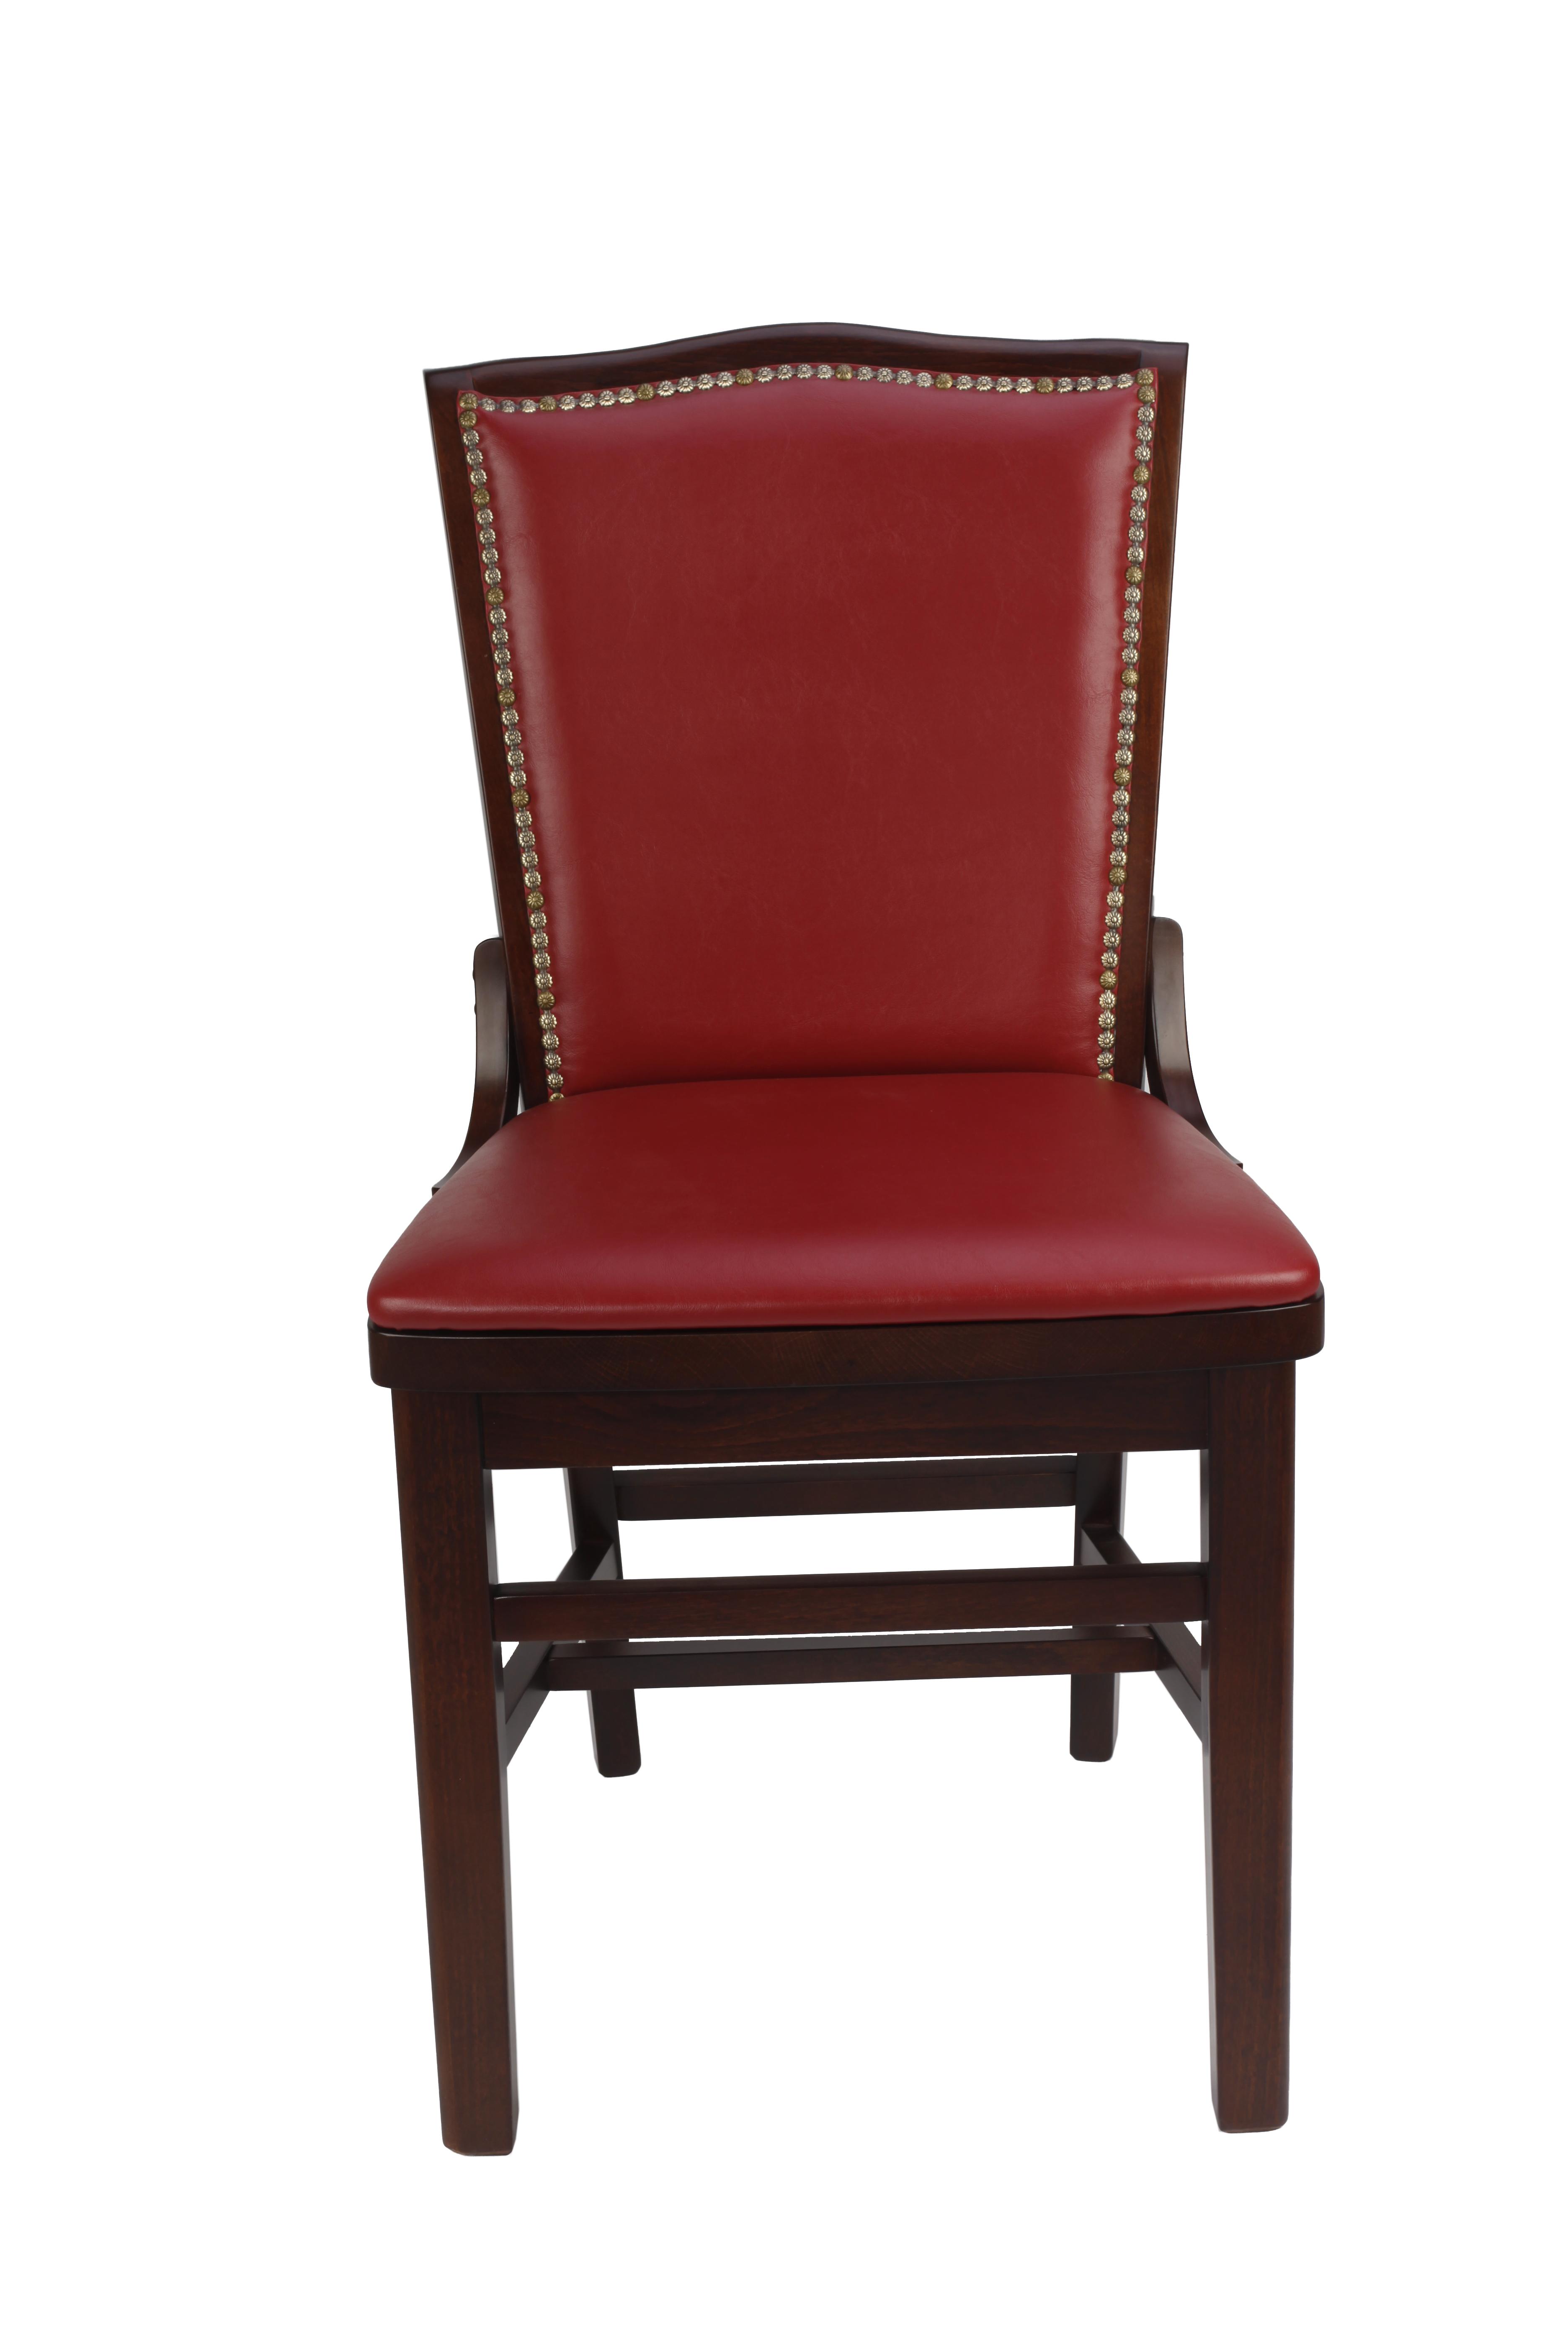 Wood chairs millennium seating usa restaurant